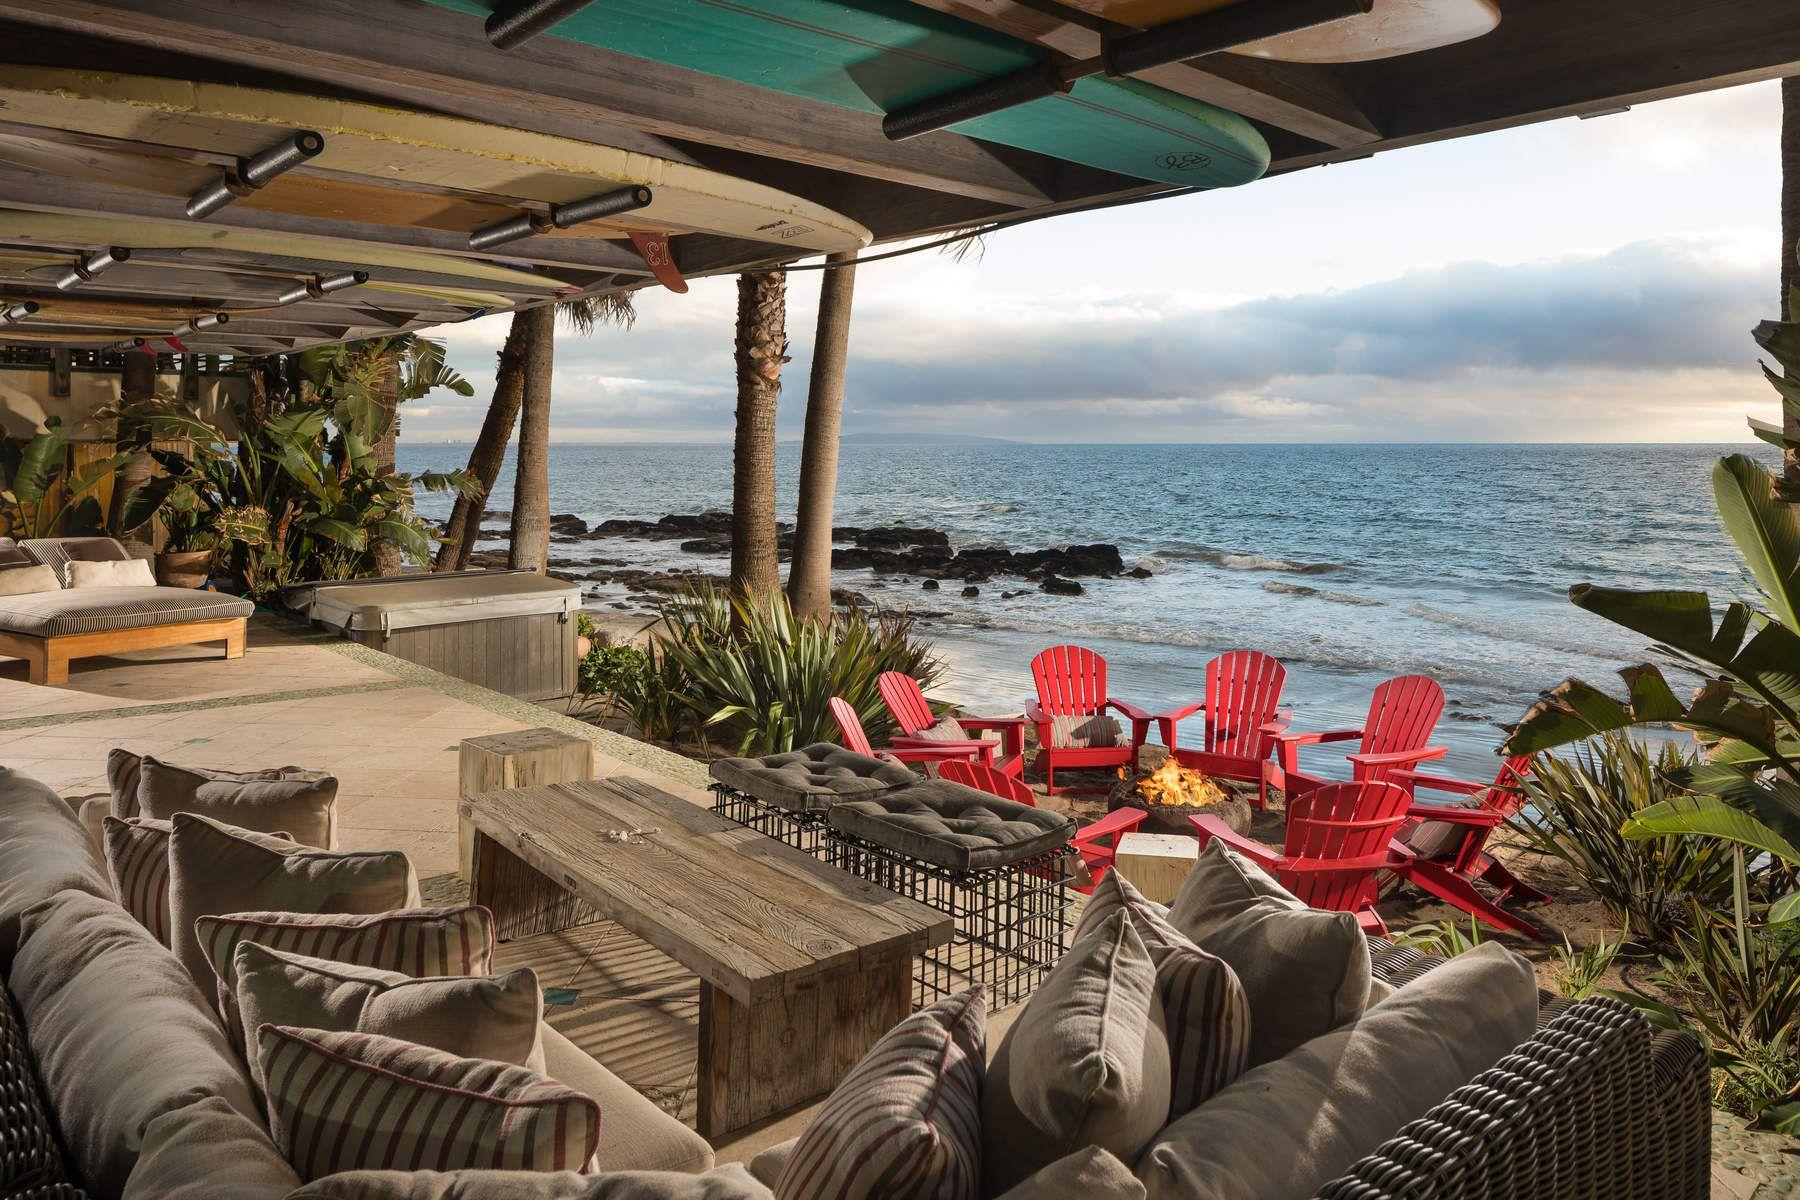 Additional photo for property listing at Malibu Beach Front Luxury Home 20906 Pacific Coast Highway Malibu, California 90265 United States